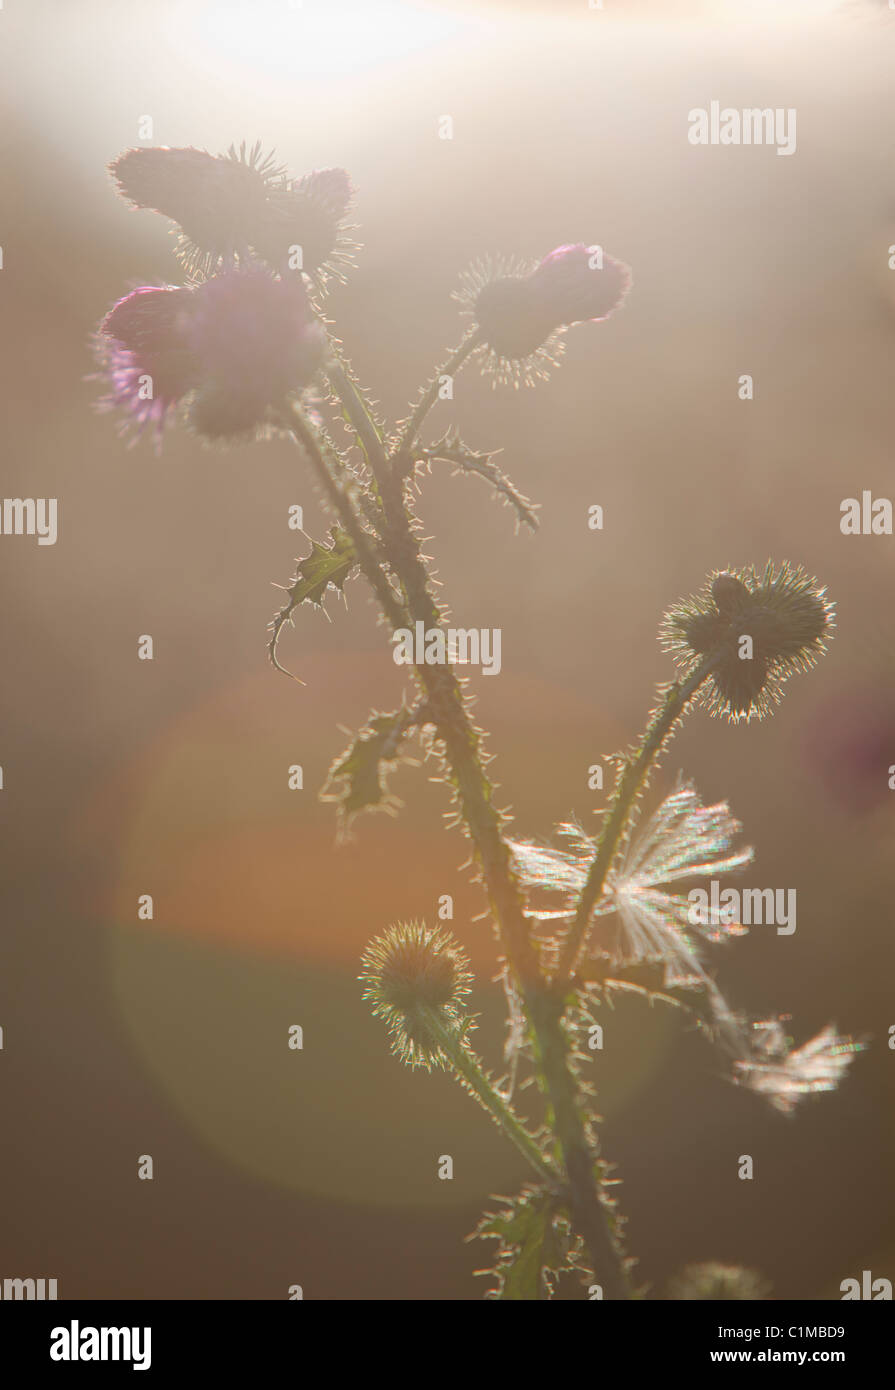 Silueta de propagar la planta de bardana ( Arctium , Asteraceae ) Imagen De Stock